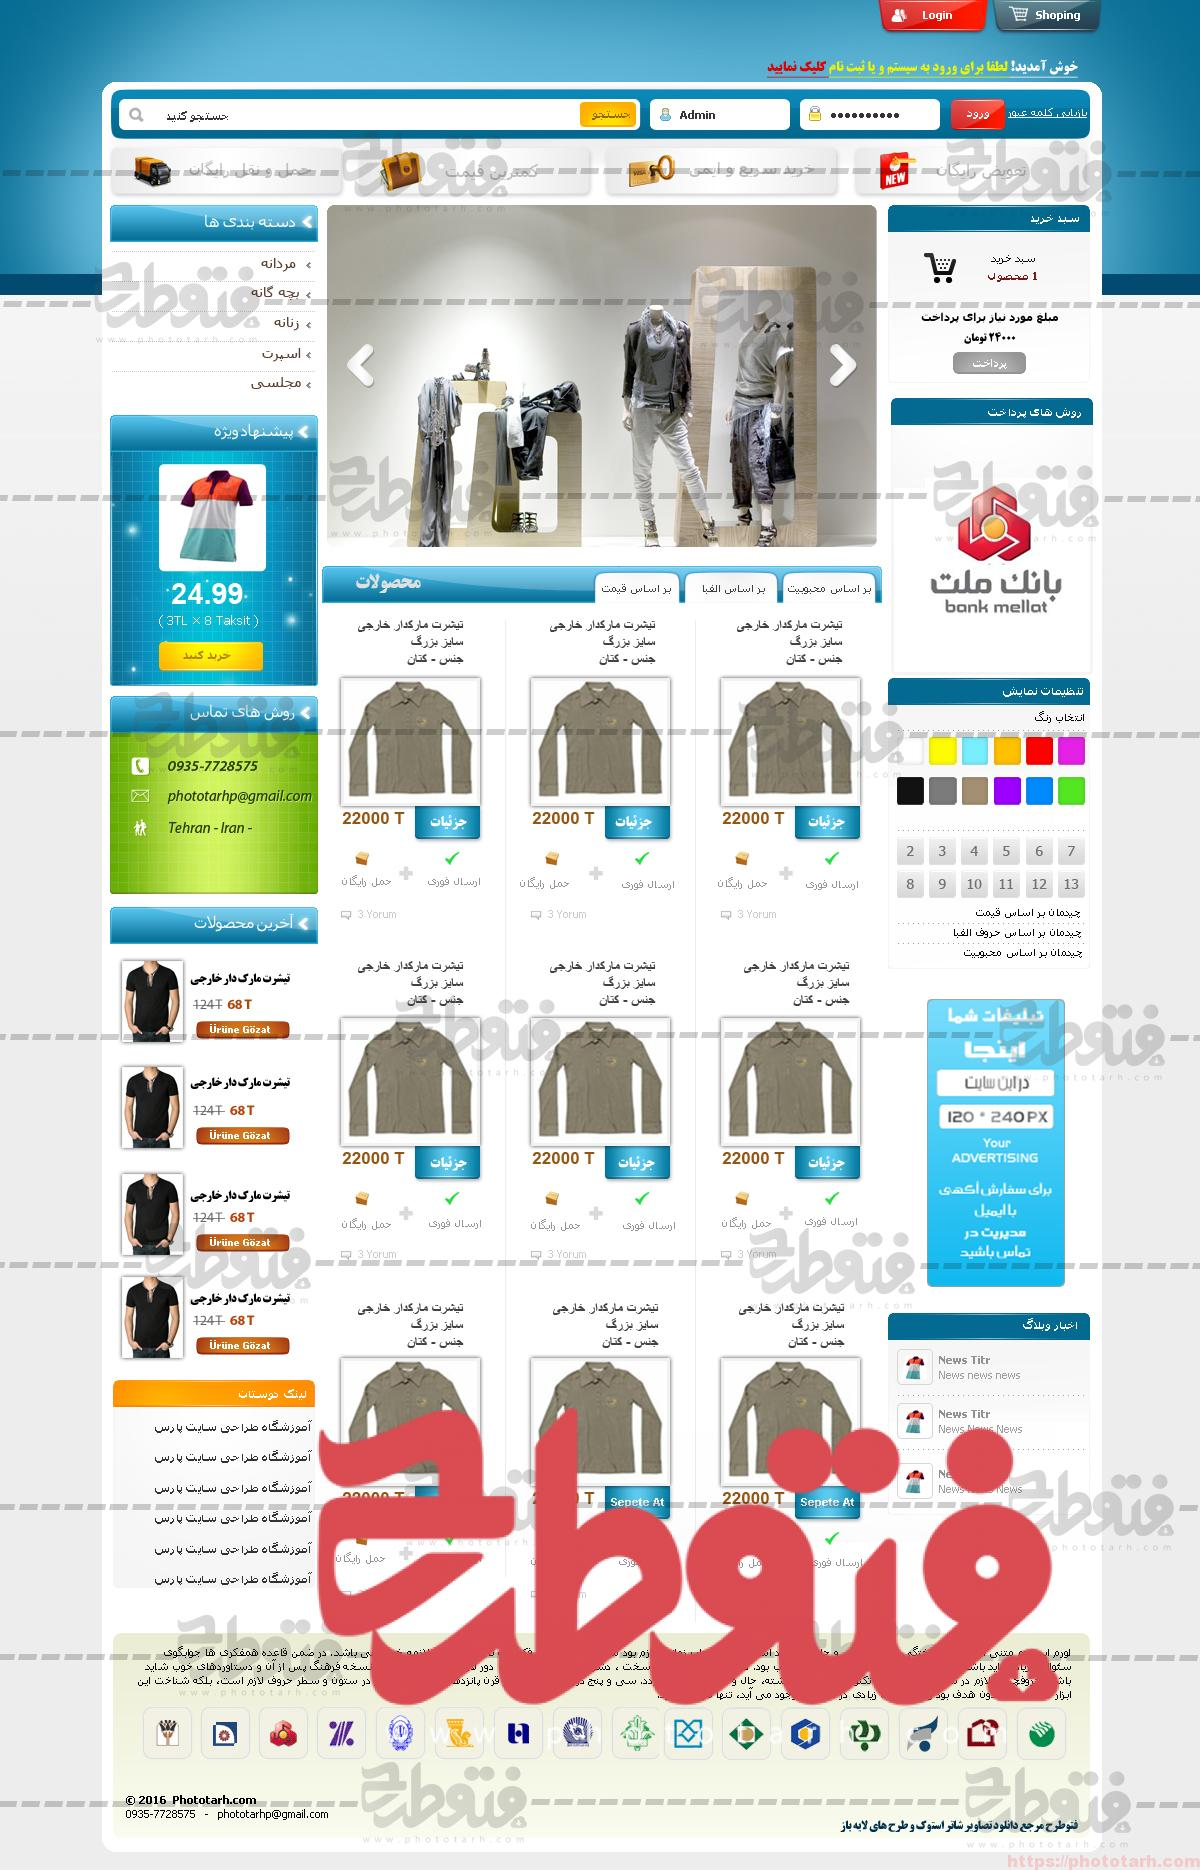 shop - قالب سایت فروشگاه لباس